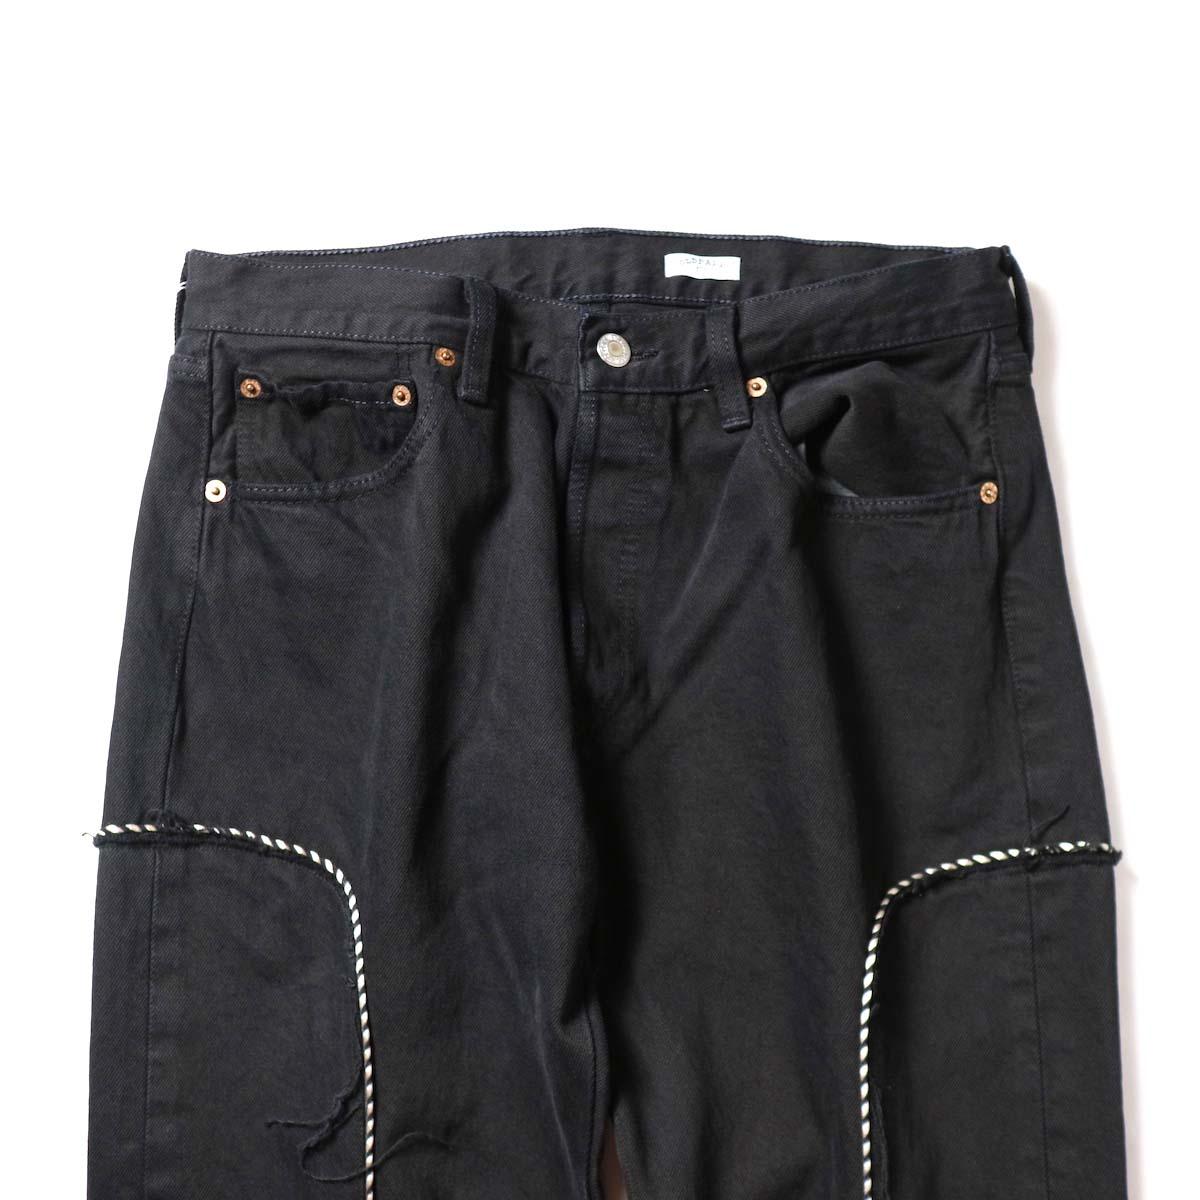 OLD PARK / Western Jeans Black (Msize-E)ウエスト